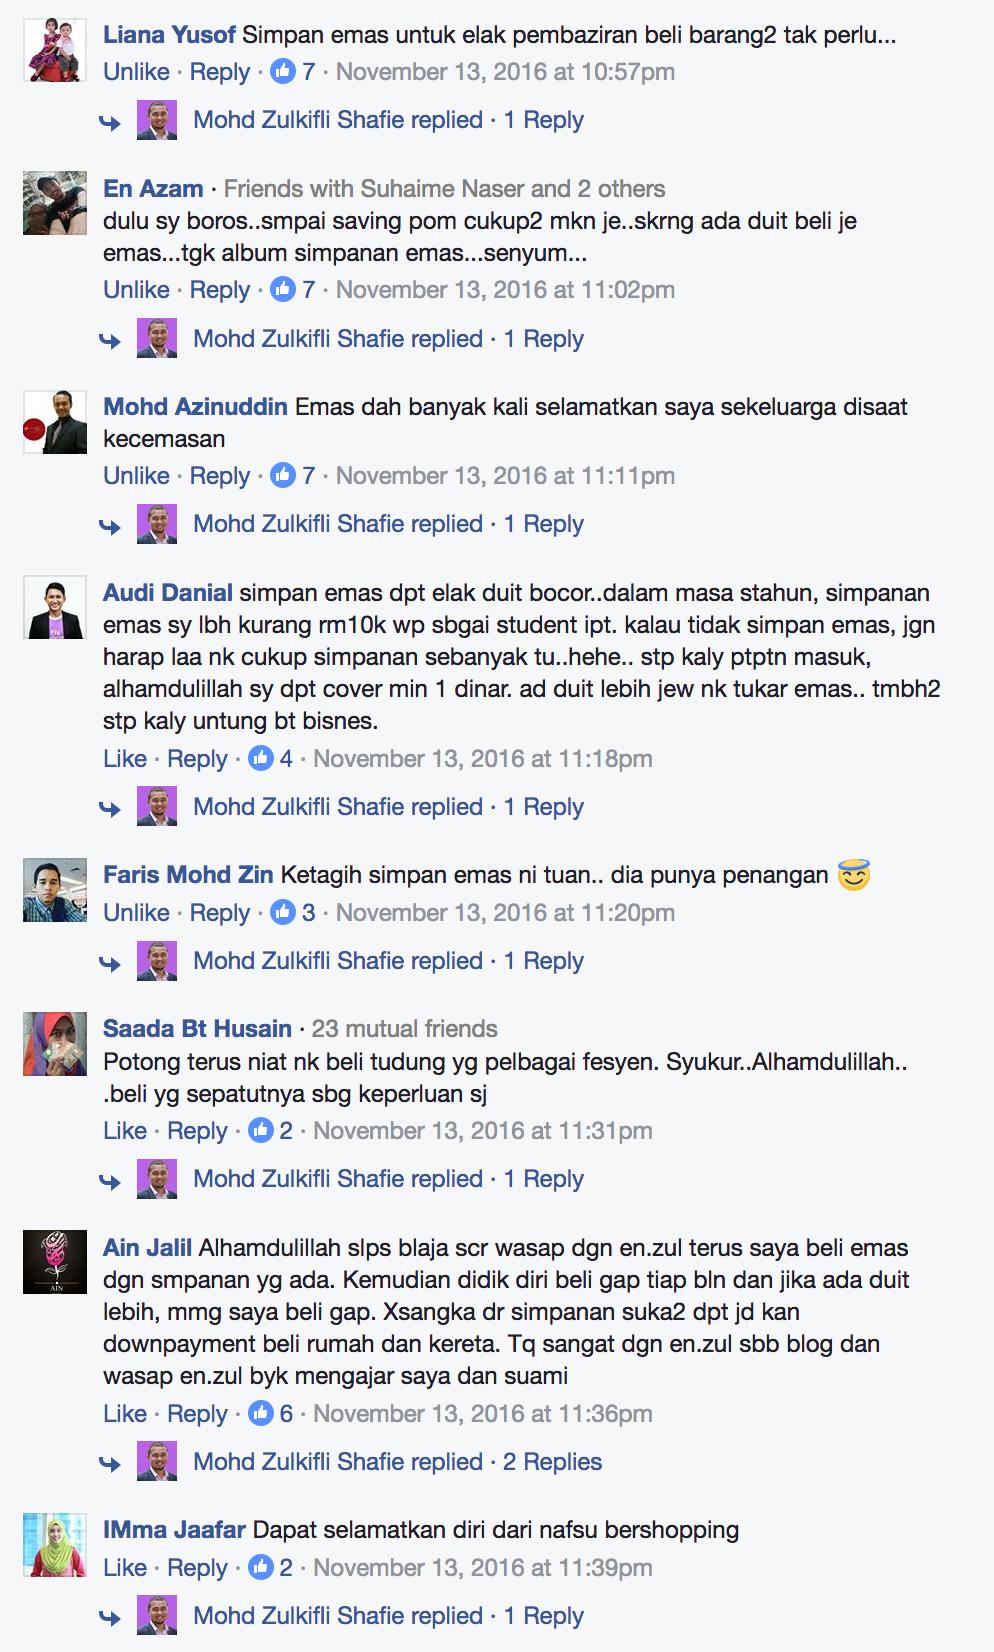 FB Screen Shot testimoni penyimpan emas 2